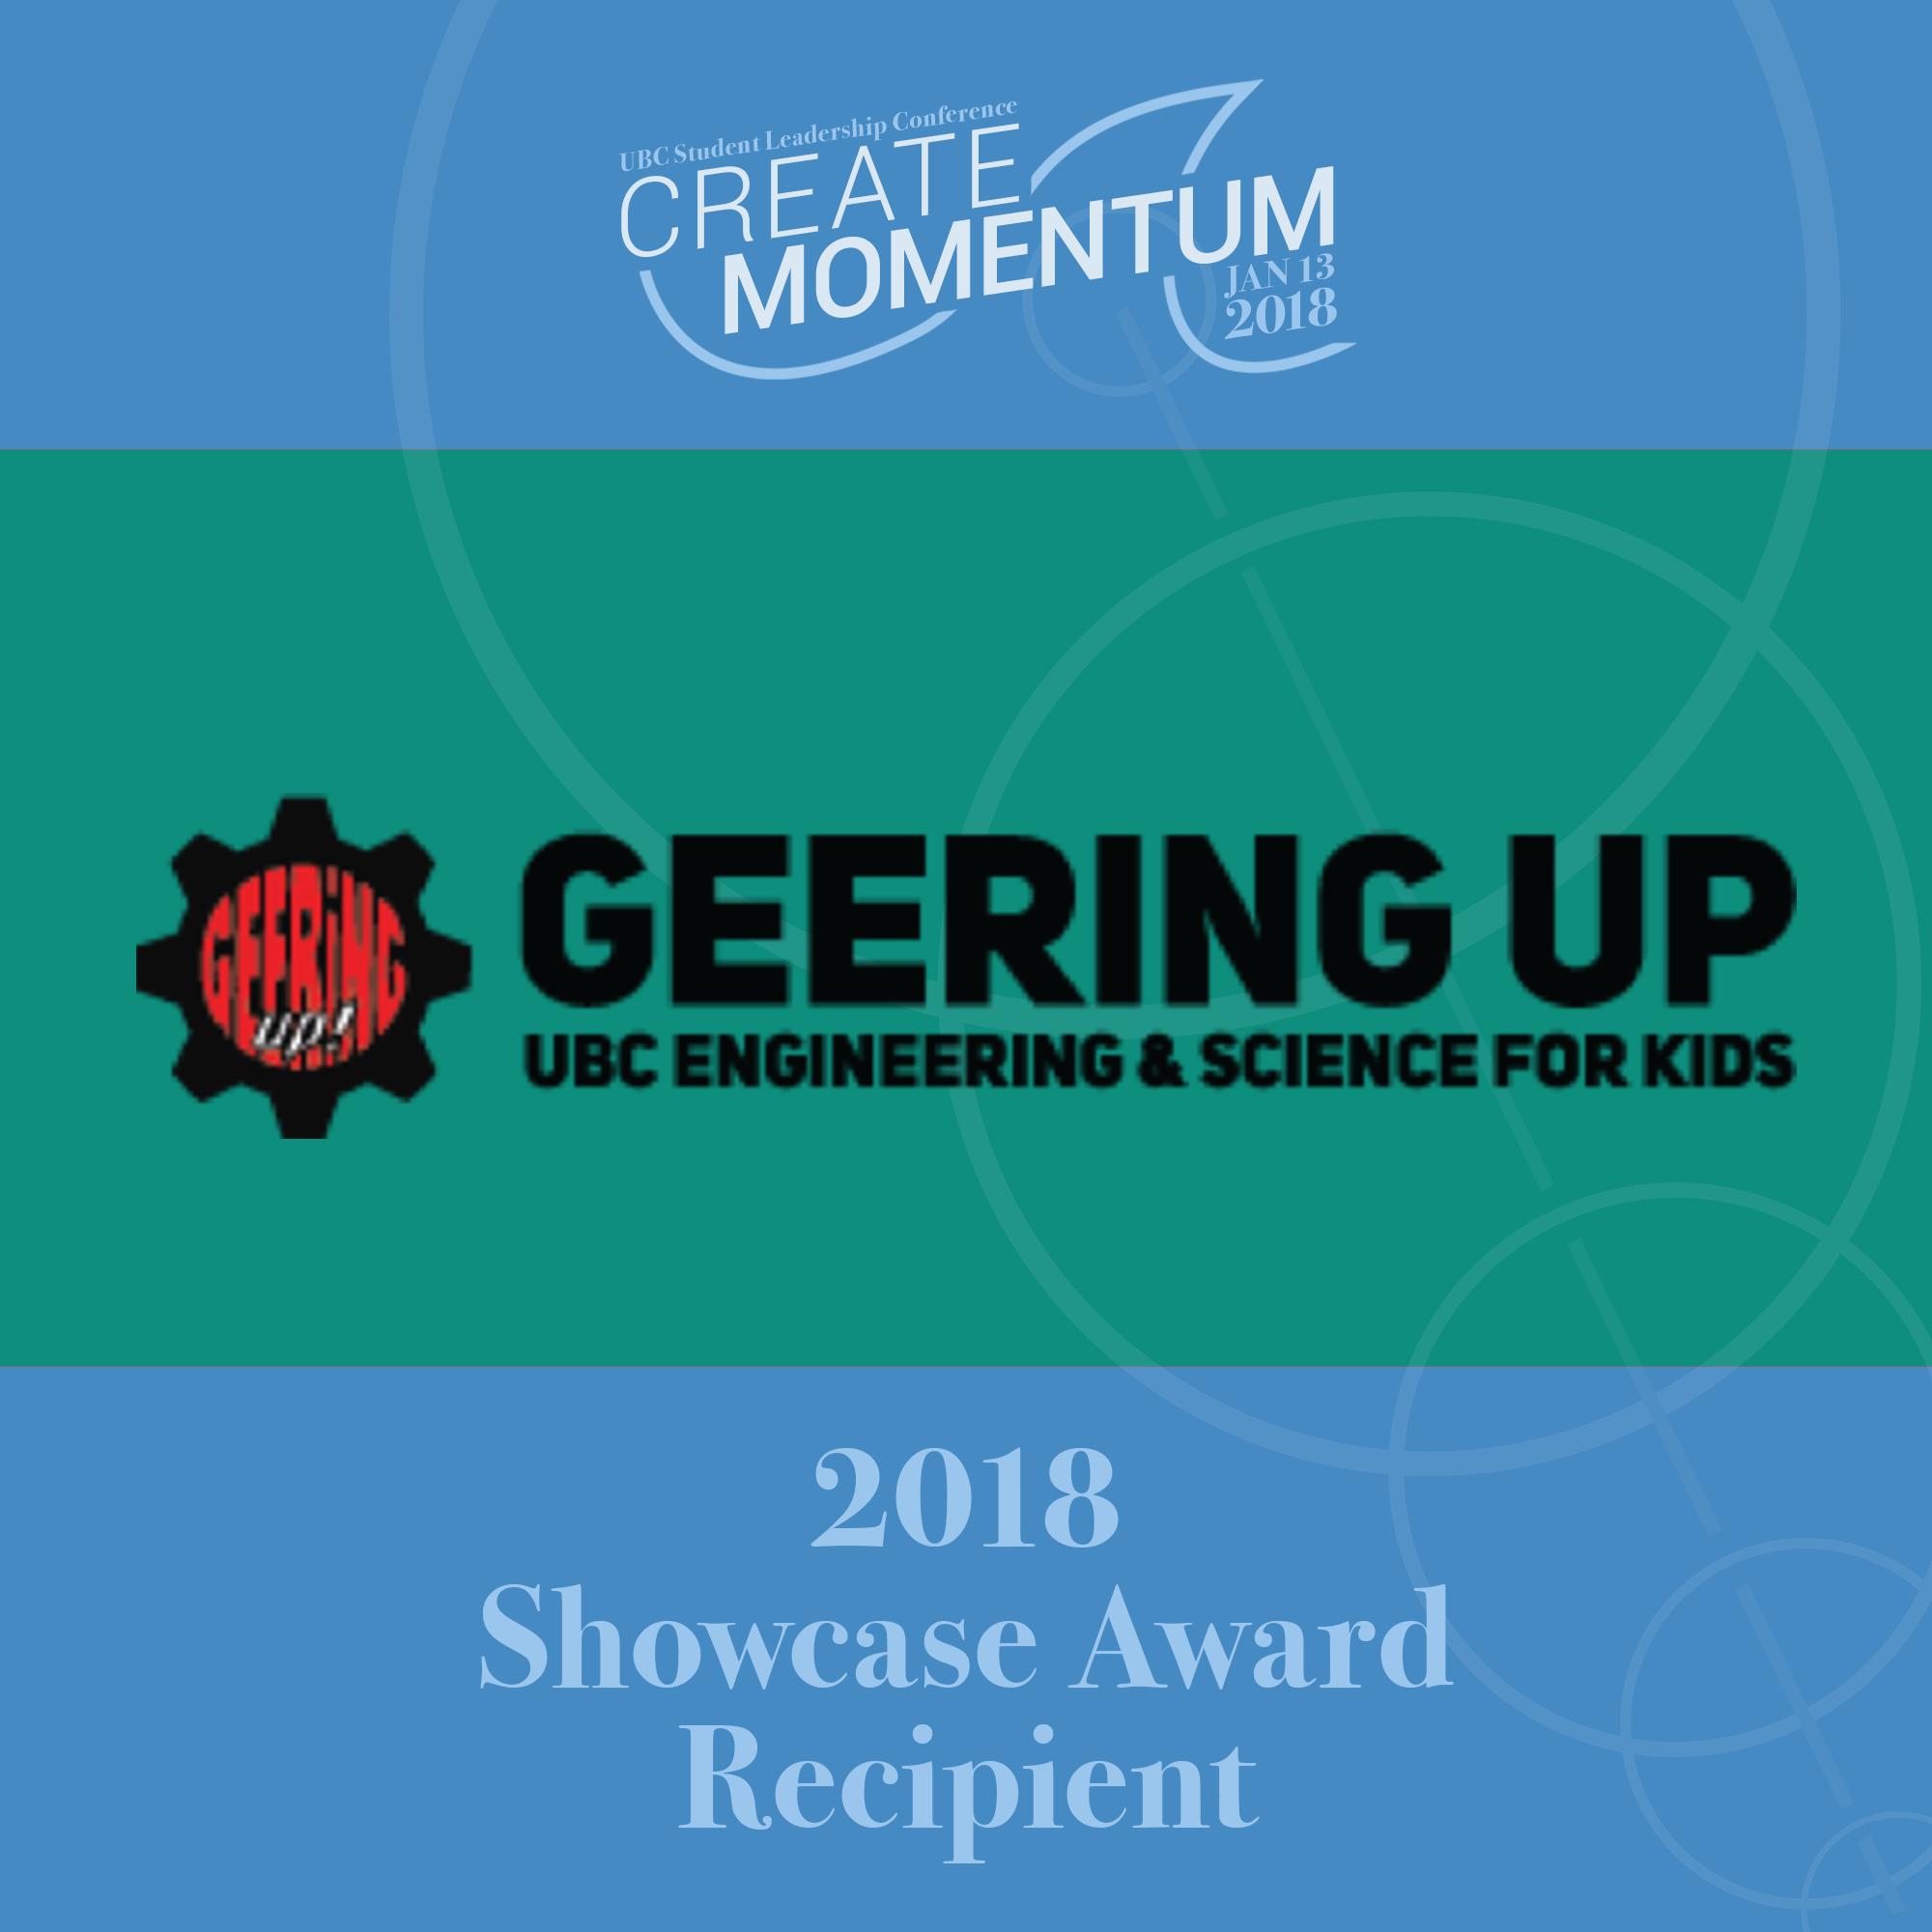 SLC Showcase Award Geering Up